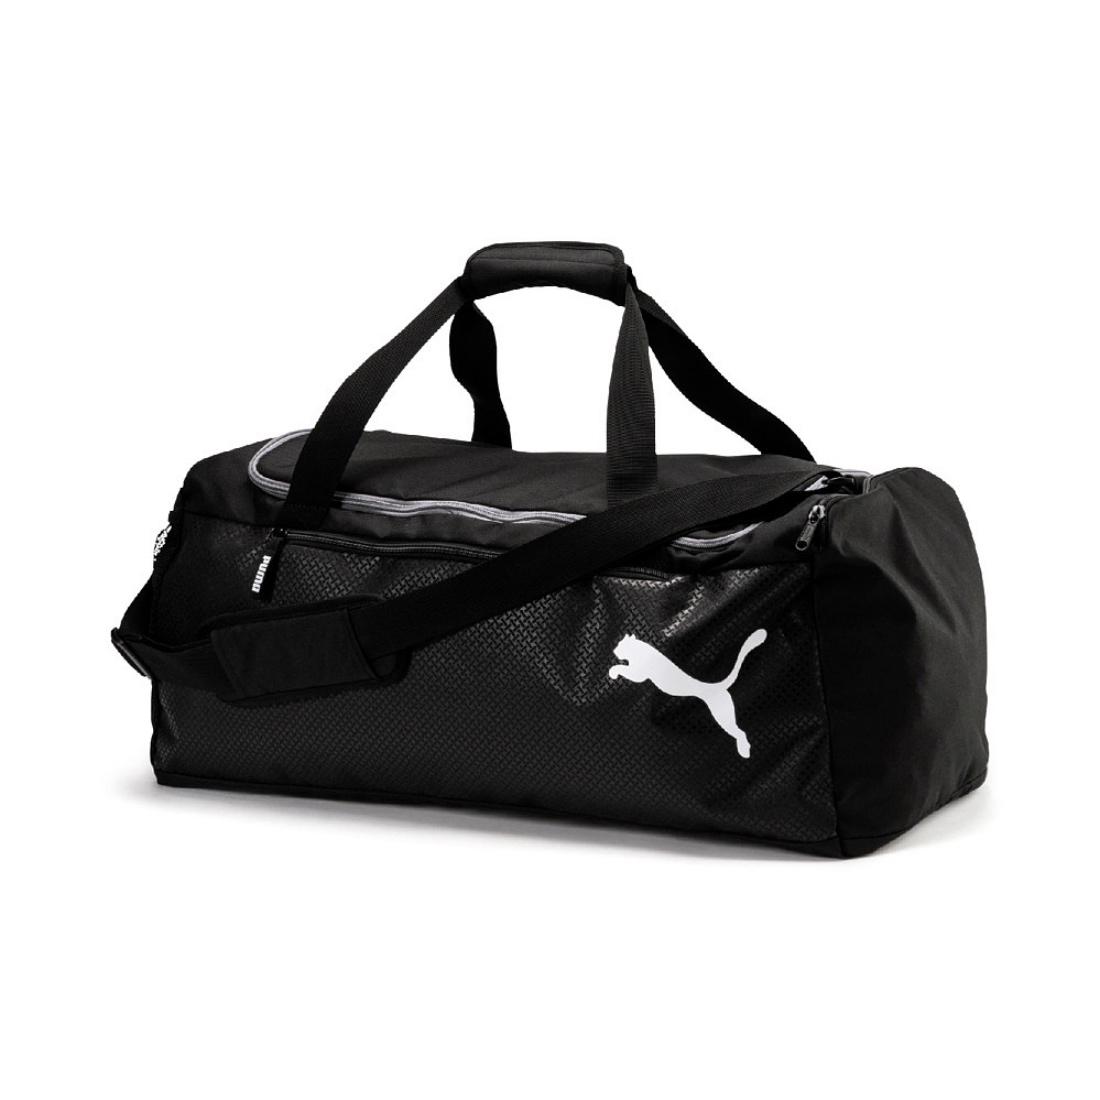 5f3629897 Details about Puma Fundamentals Sports BAG M   Sports Sport Bag SIZE M  075528